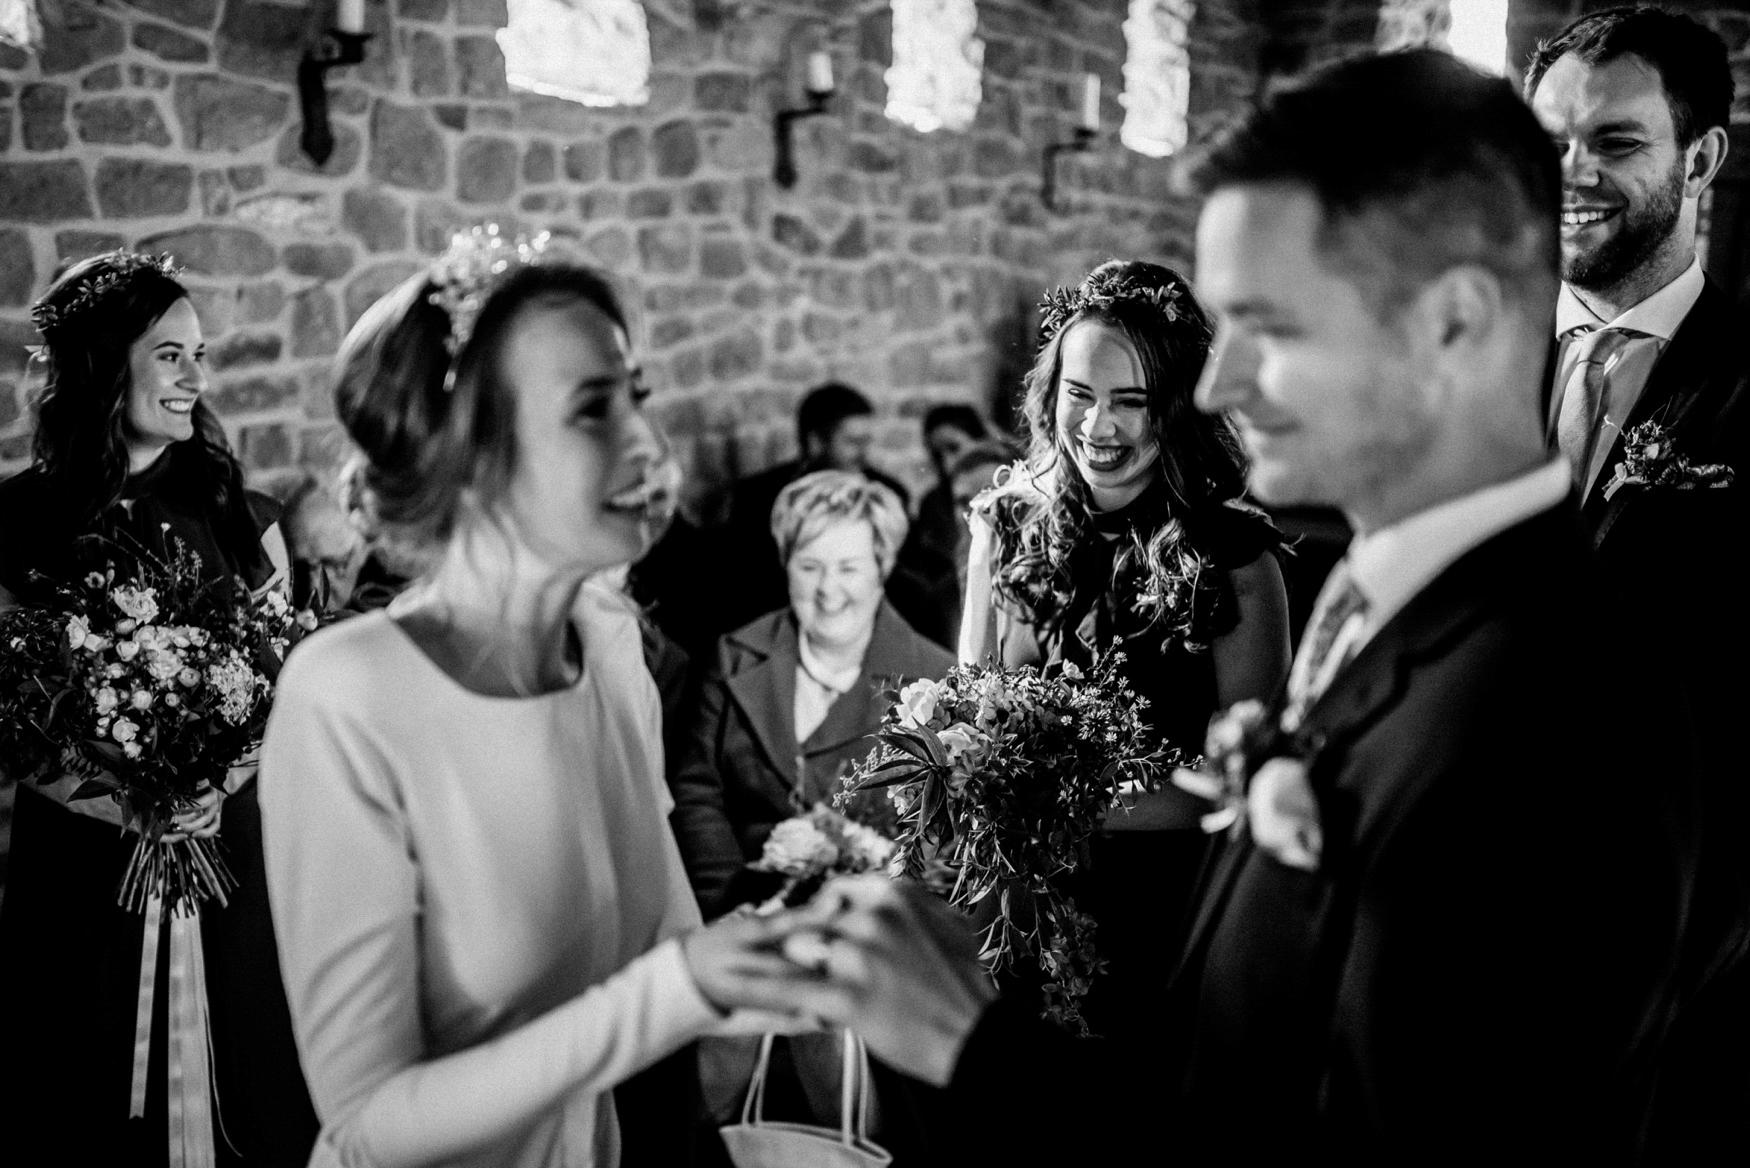 2 prague wedding photographer - boho svatba zikmundov022.jpg